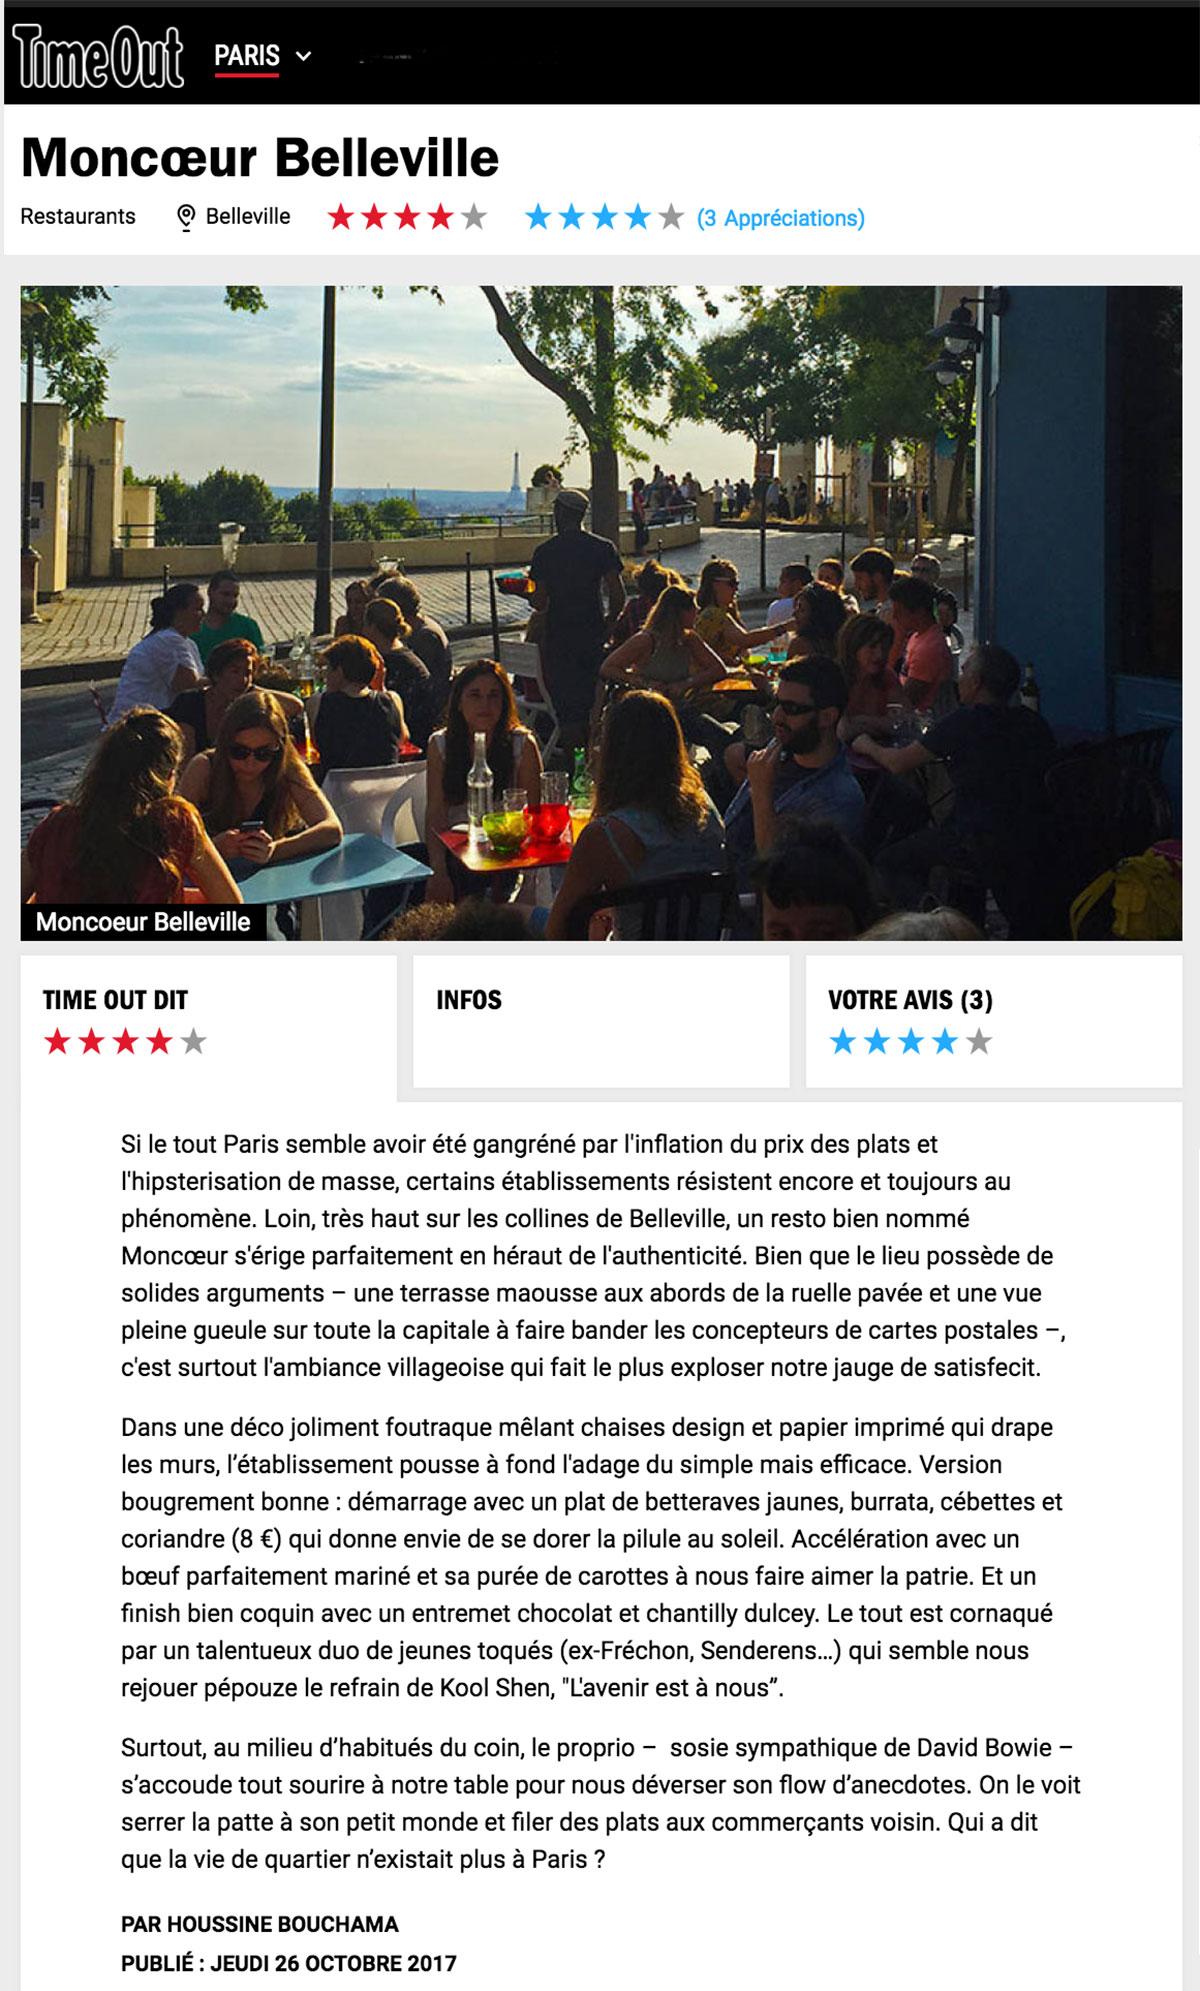 moncoeur-belleville-restaurant-terrasse-paris-timeout